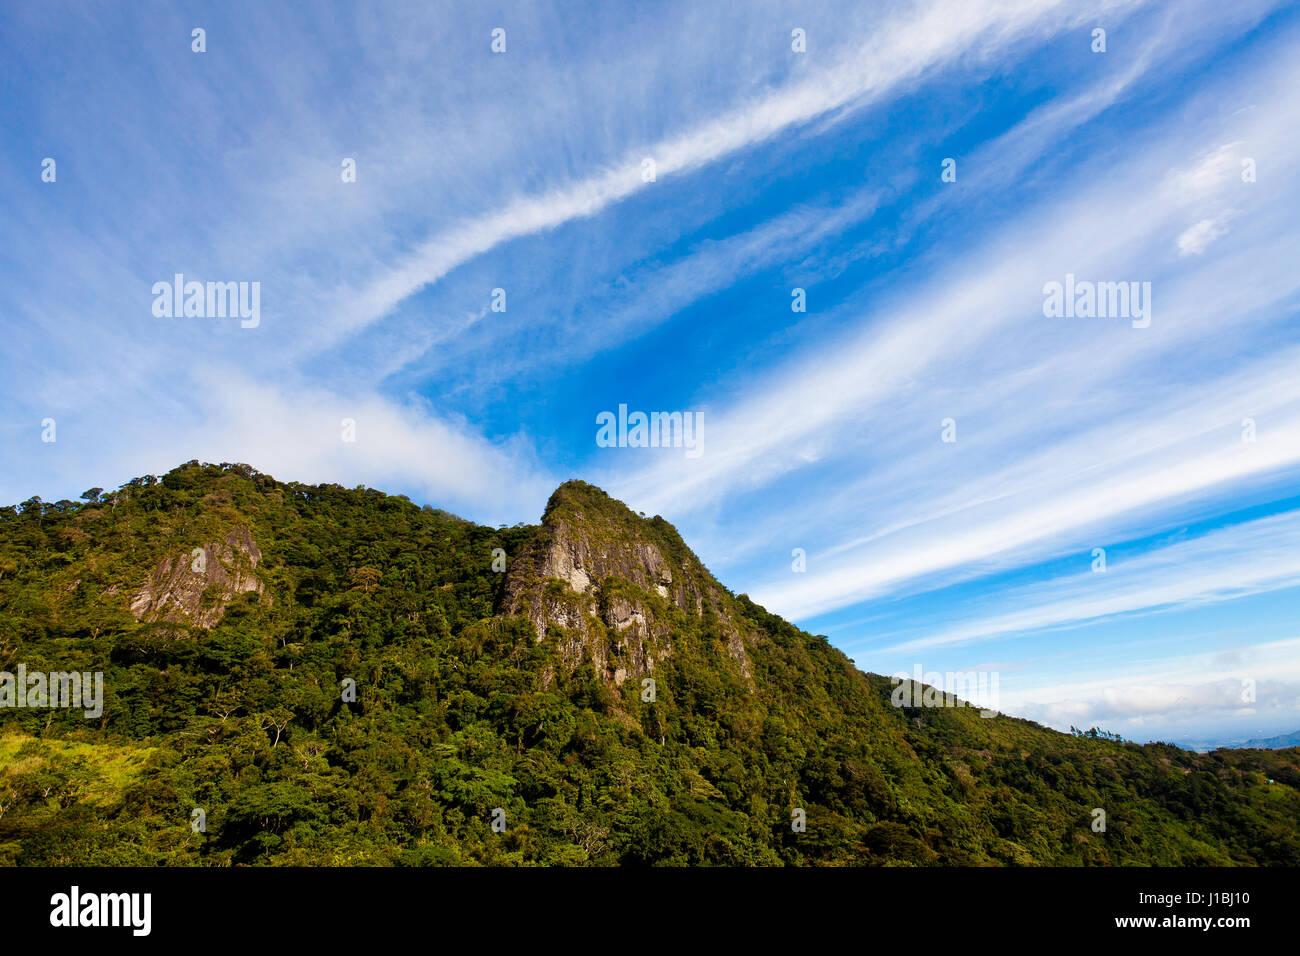 Beautiful skies over Cerro la Cruz in Altos de Campana National Park, Republic of Panama. Stock Photo